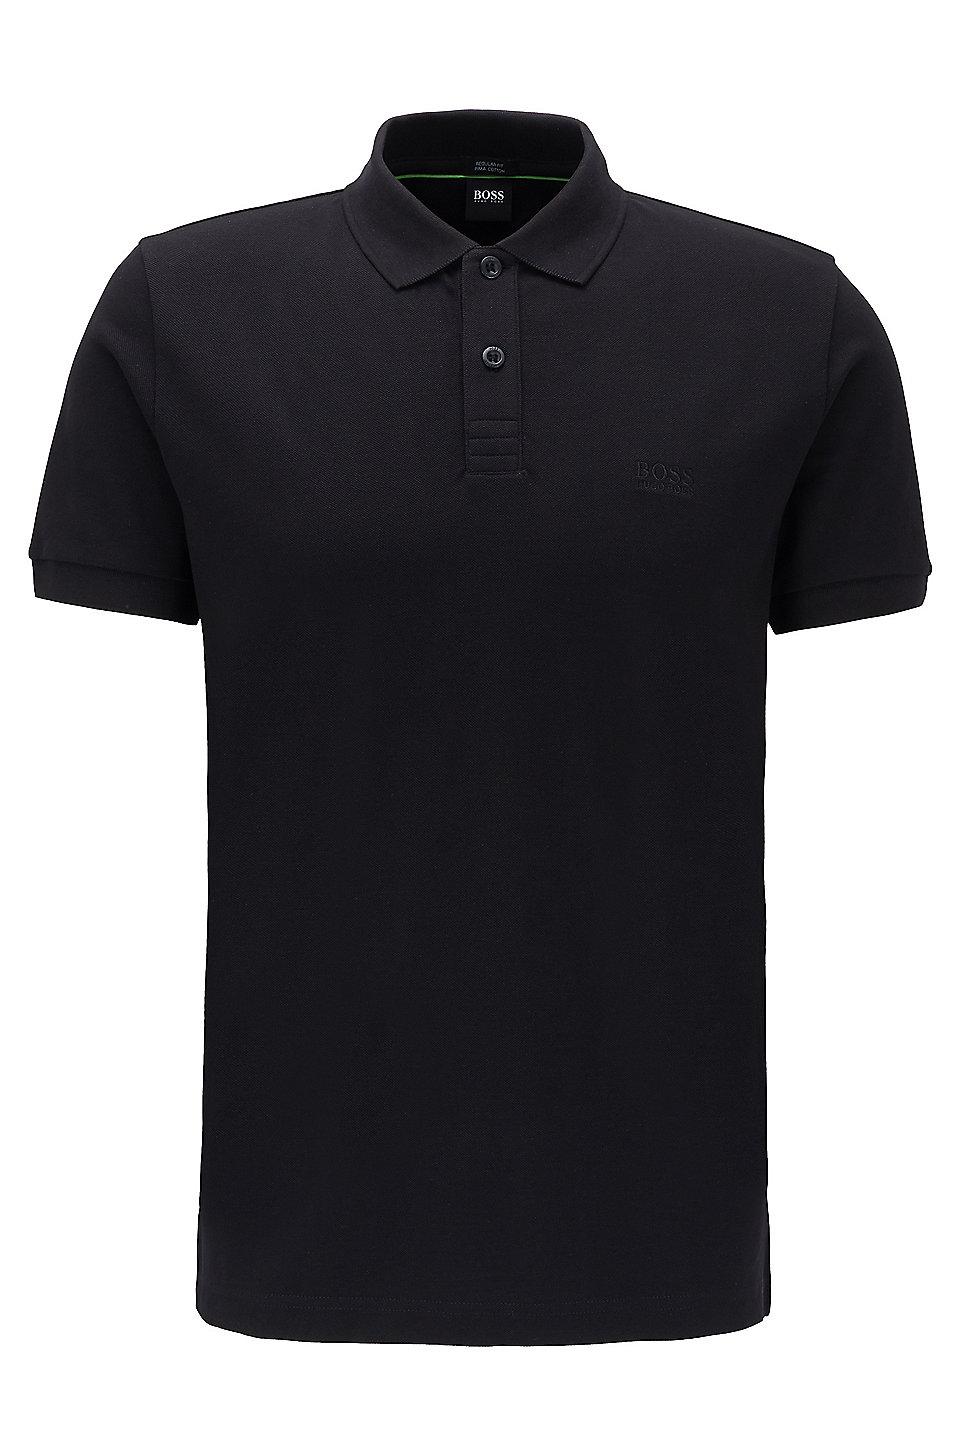 BNWT Hugo Boss Modern Fit Polo Shirt Size M